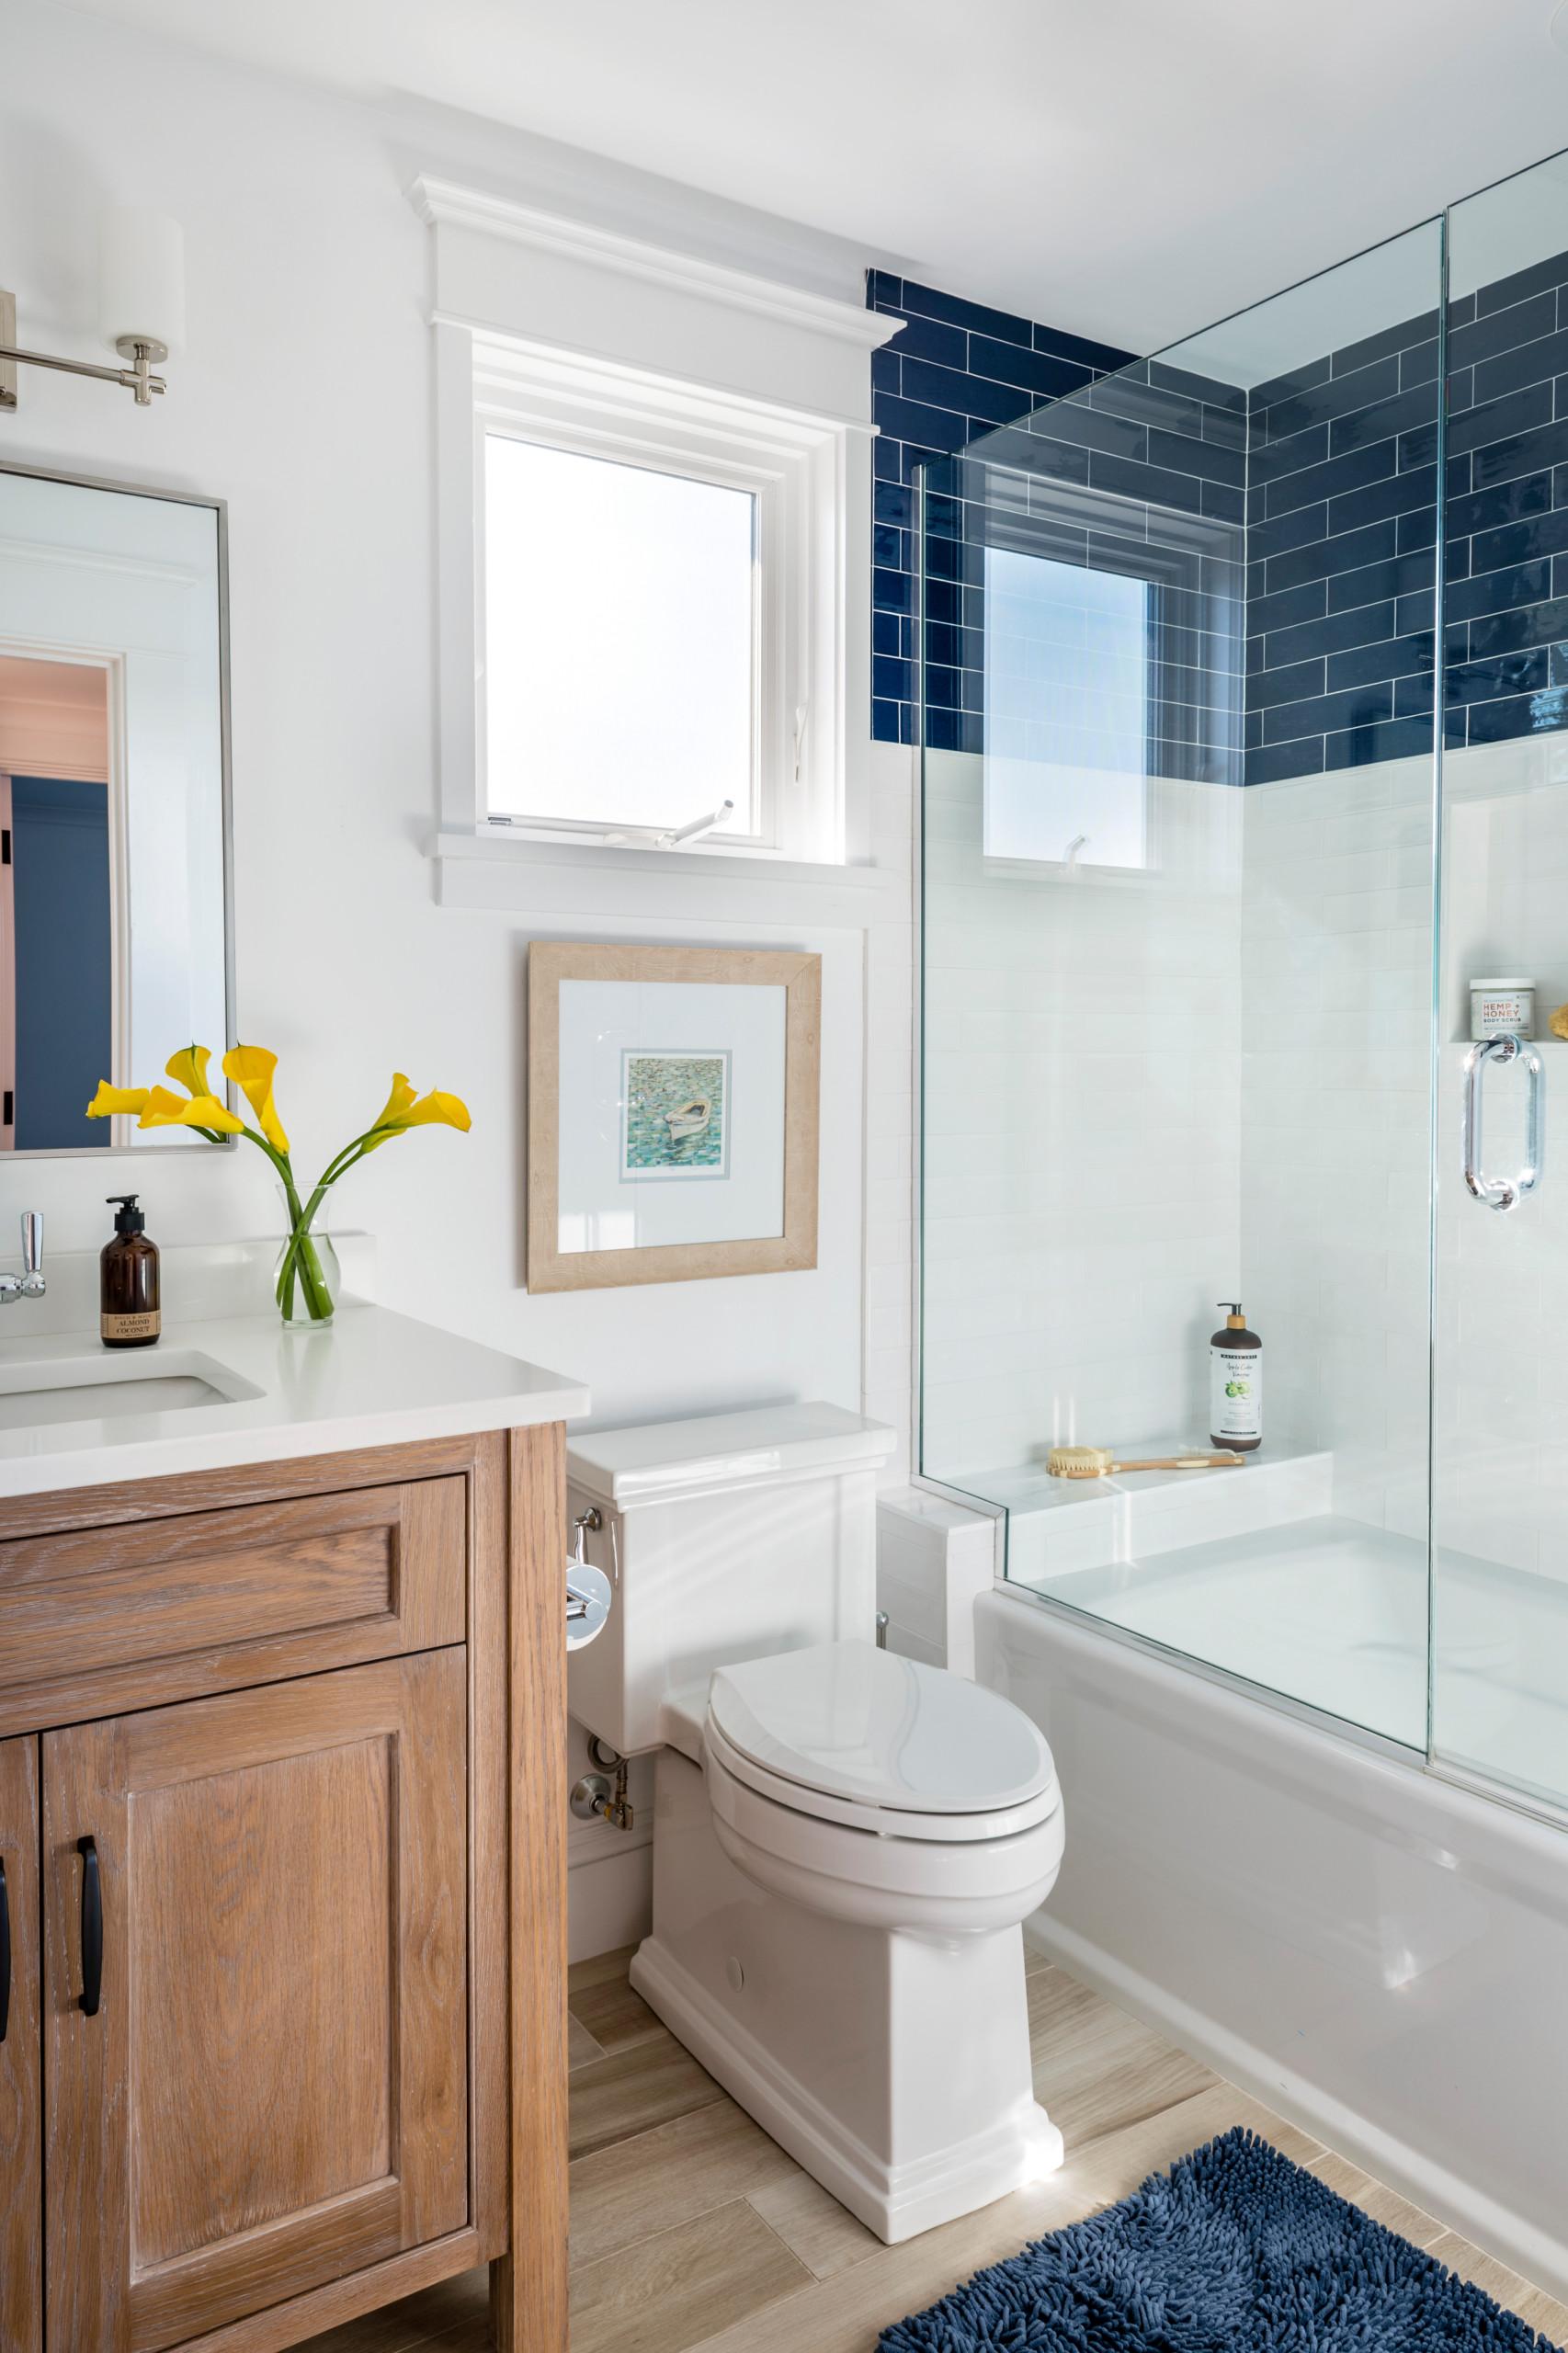 75 Beautiful Coastal Bathroom Pictures, Coastal Bathroom Tile Ideas